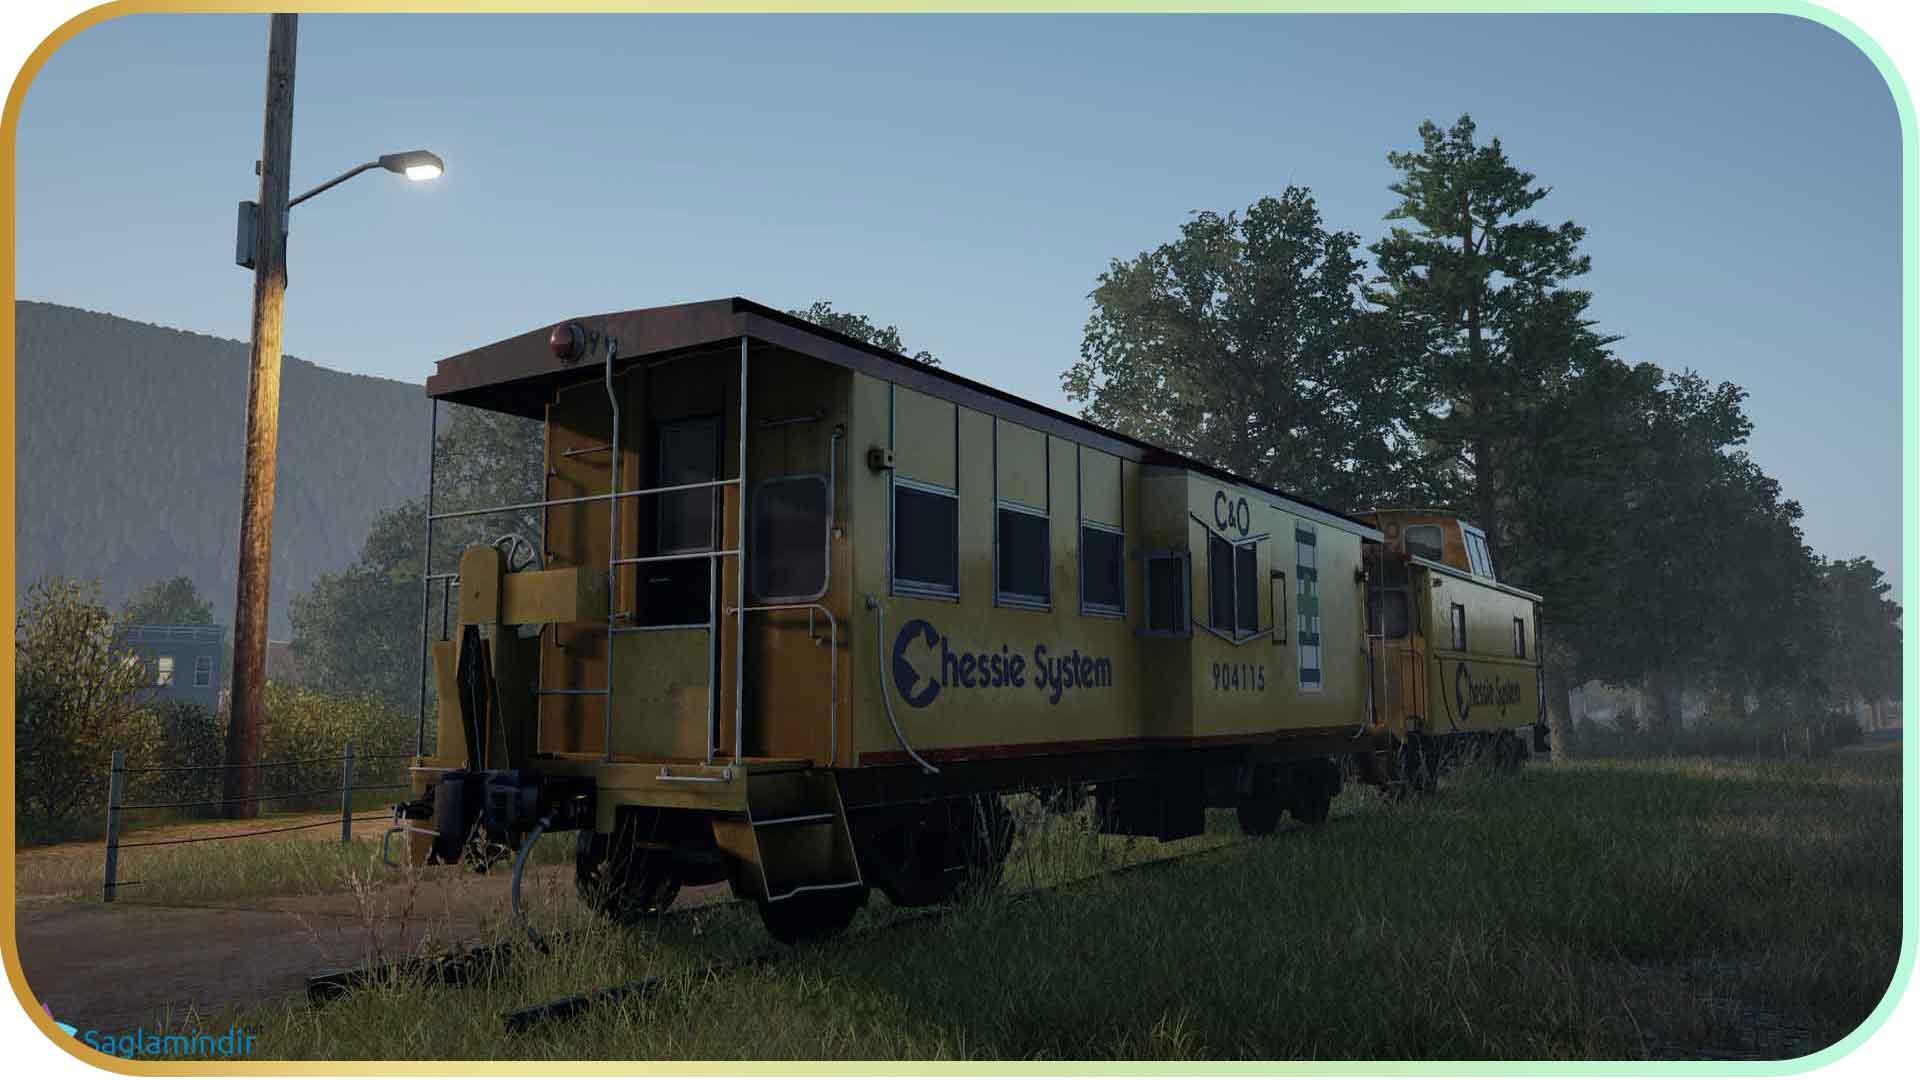 Train Sim World saglamindir